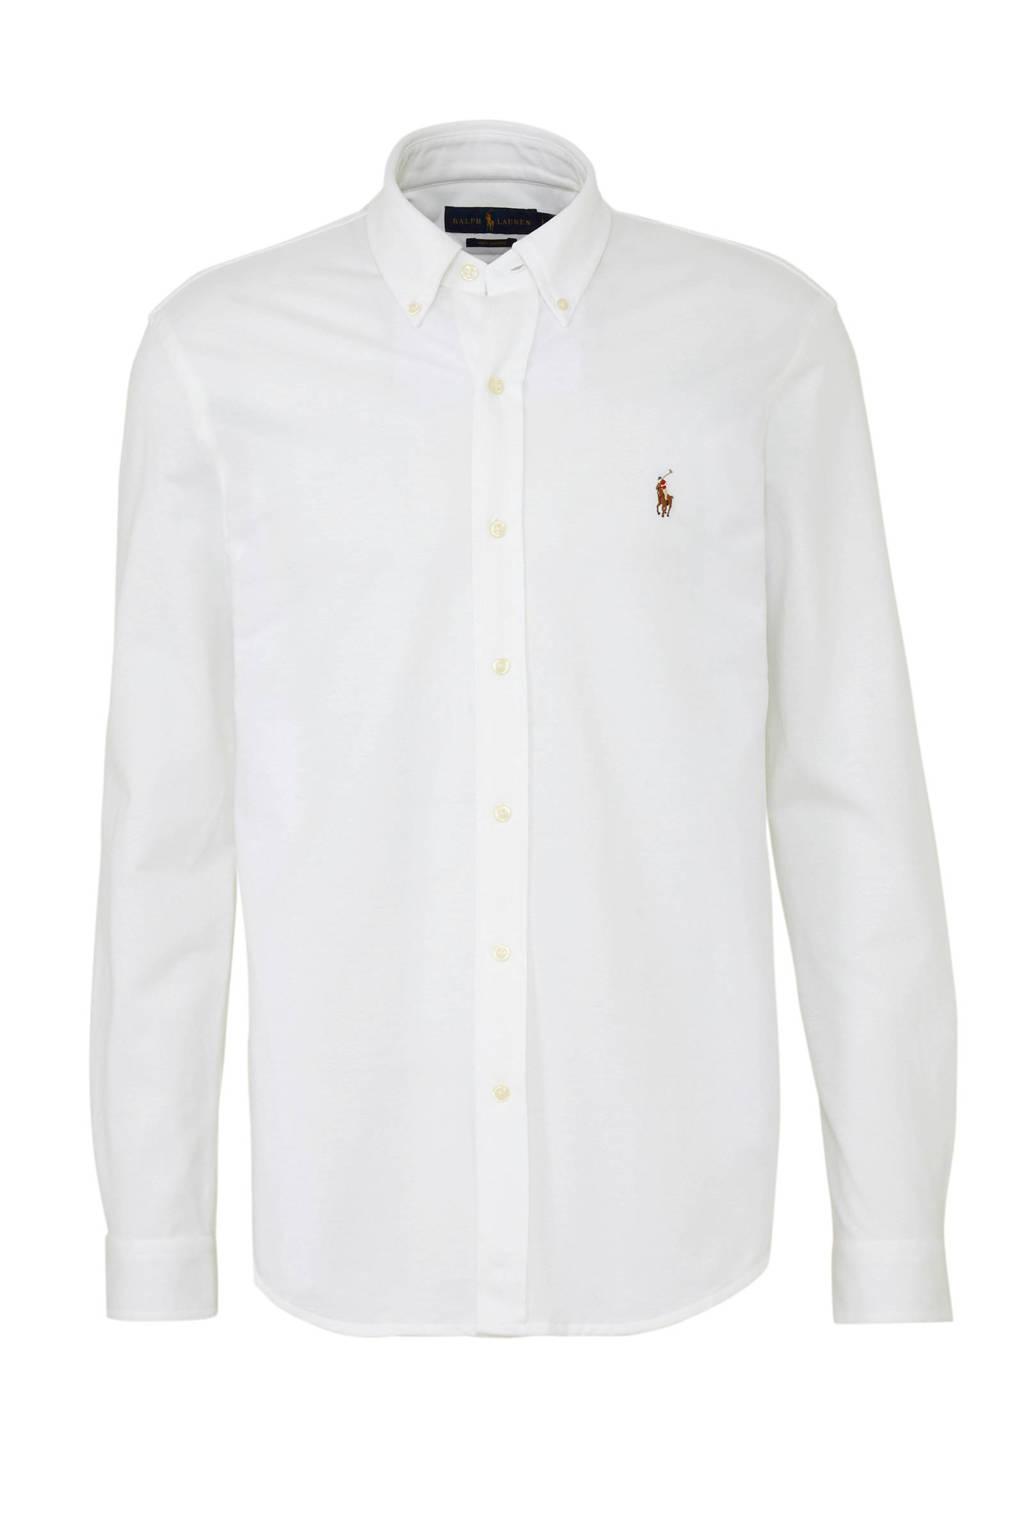 POLO Ralph Lauren overhemd wit, Wit